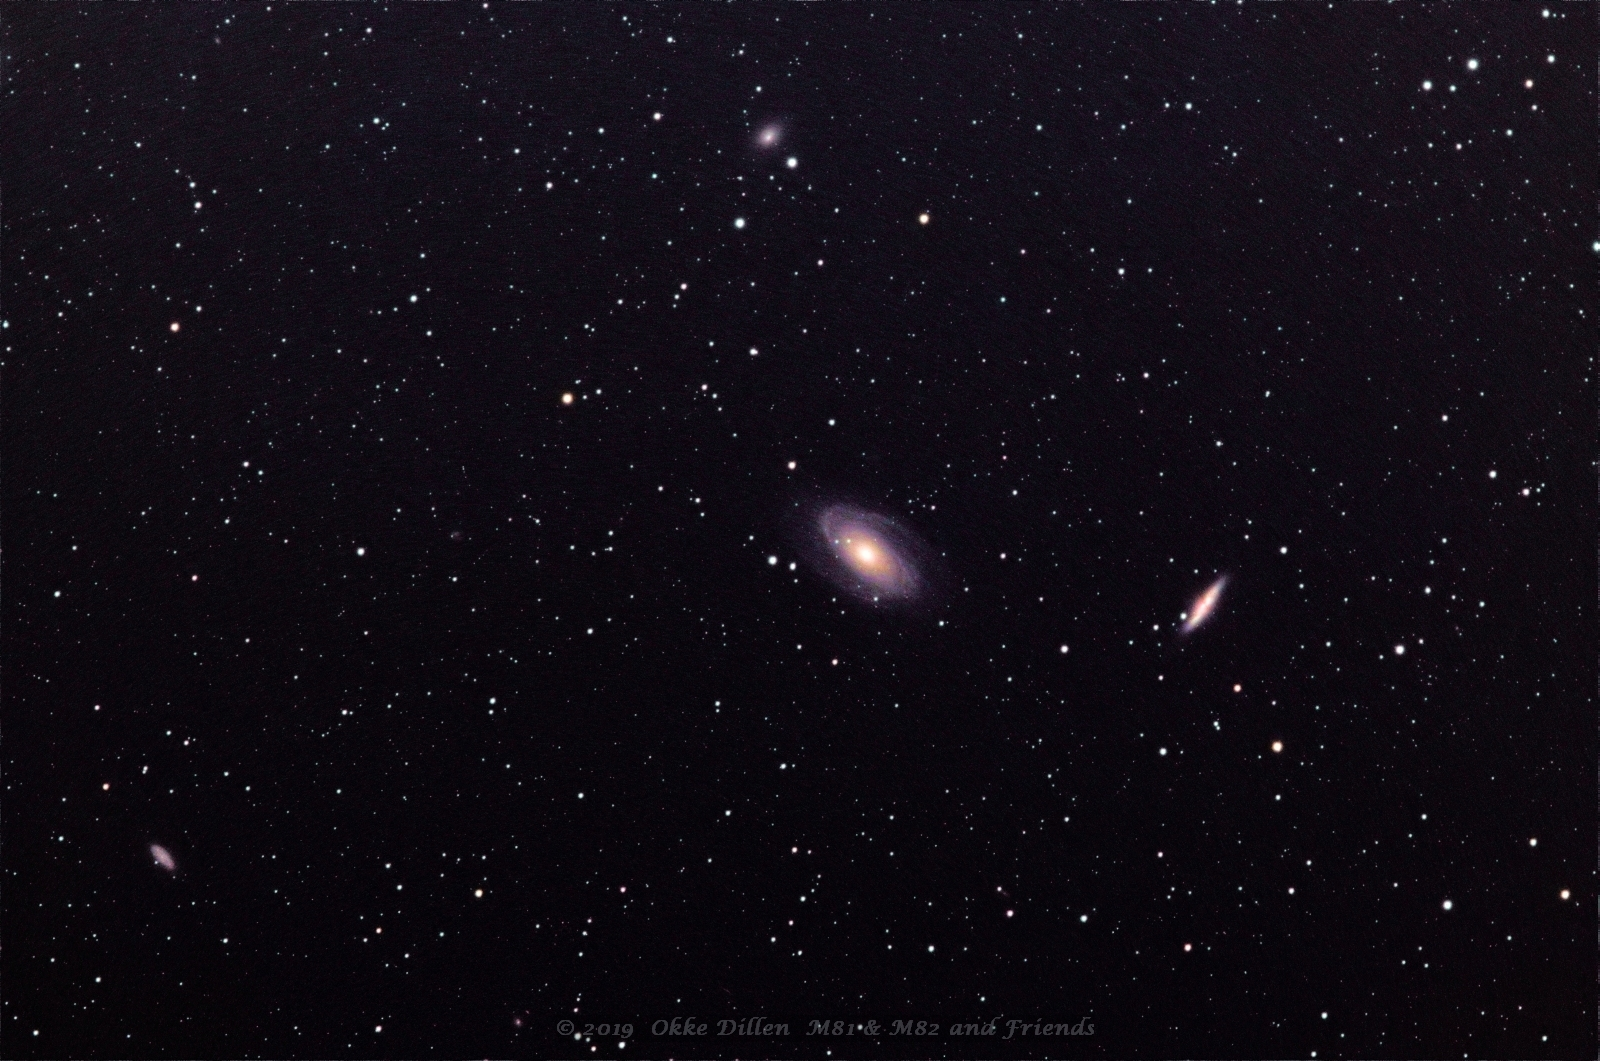 M81+M82+Friends_dss3_hs4_ps2_1600_neat_ps_p_fc.jpg